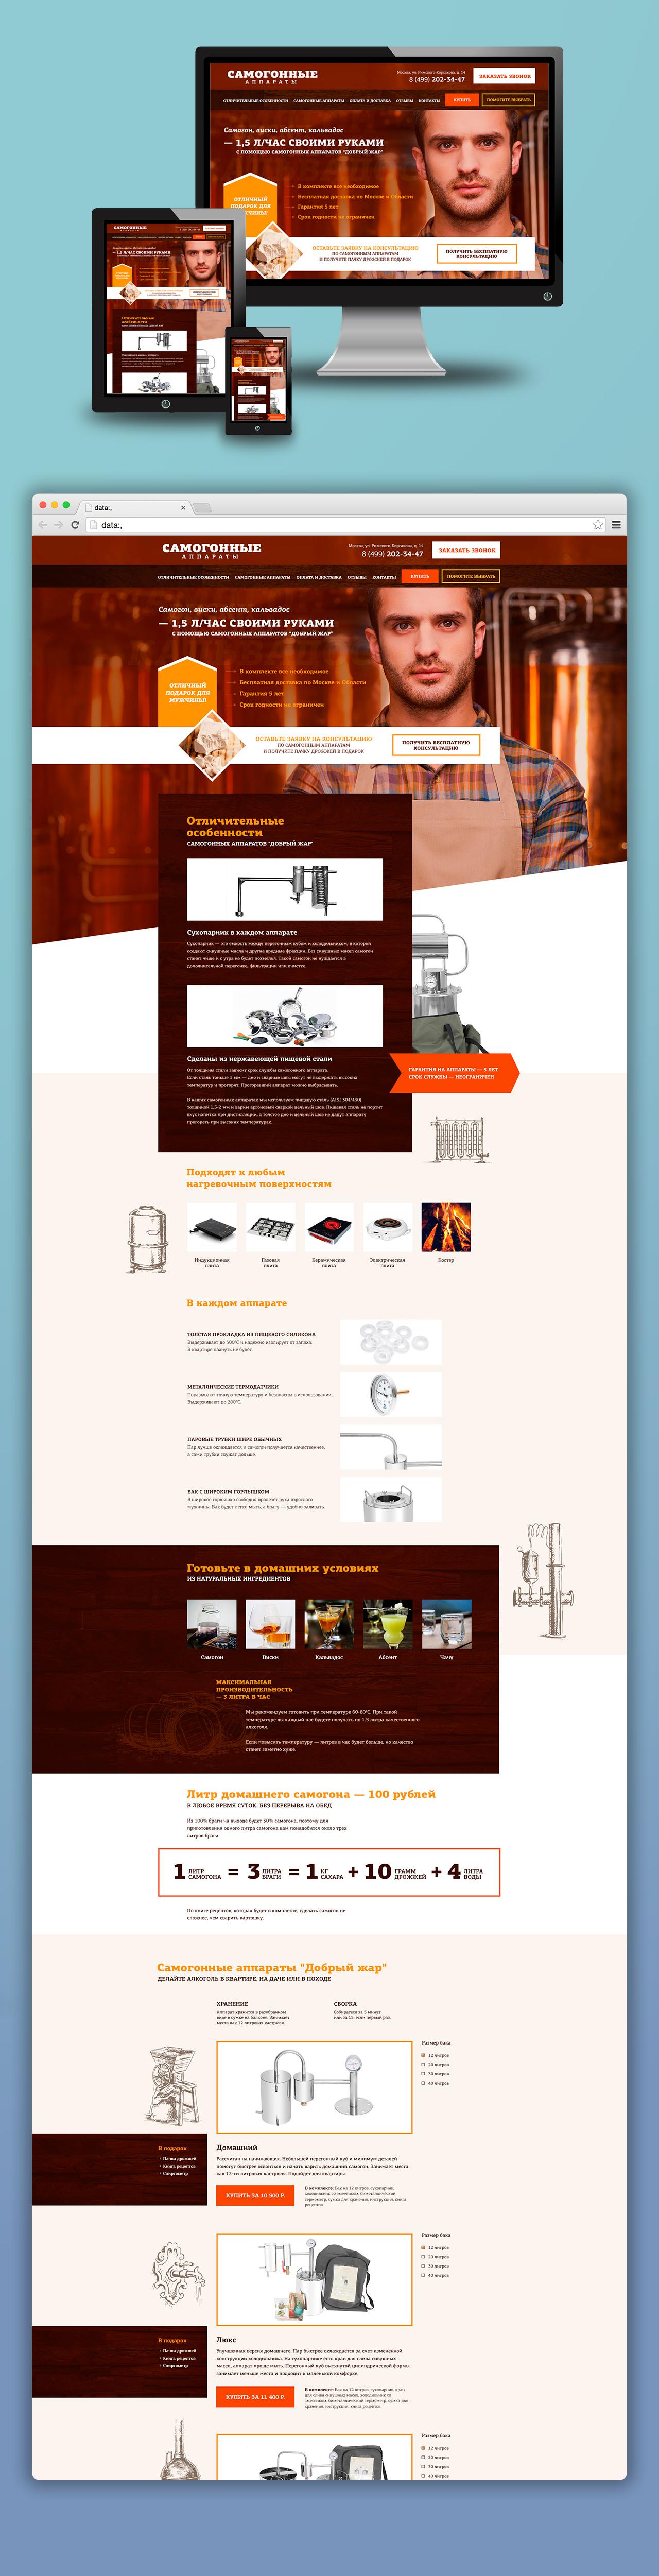 Дизайн Landing Page для продаж самогонных аппаратов Добрый Жар